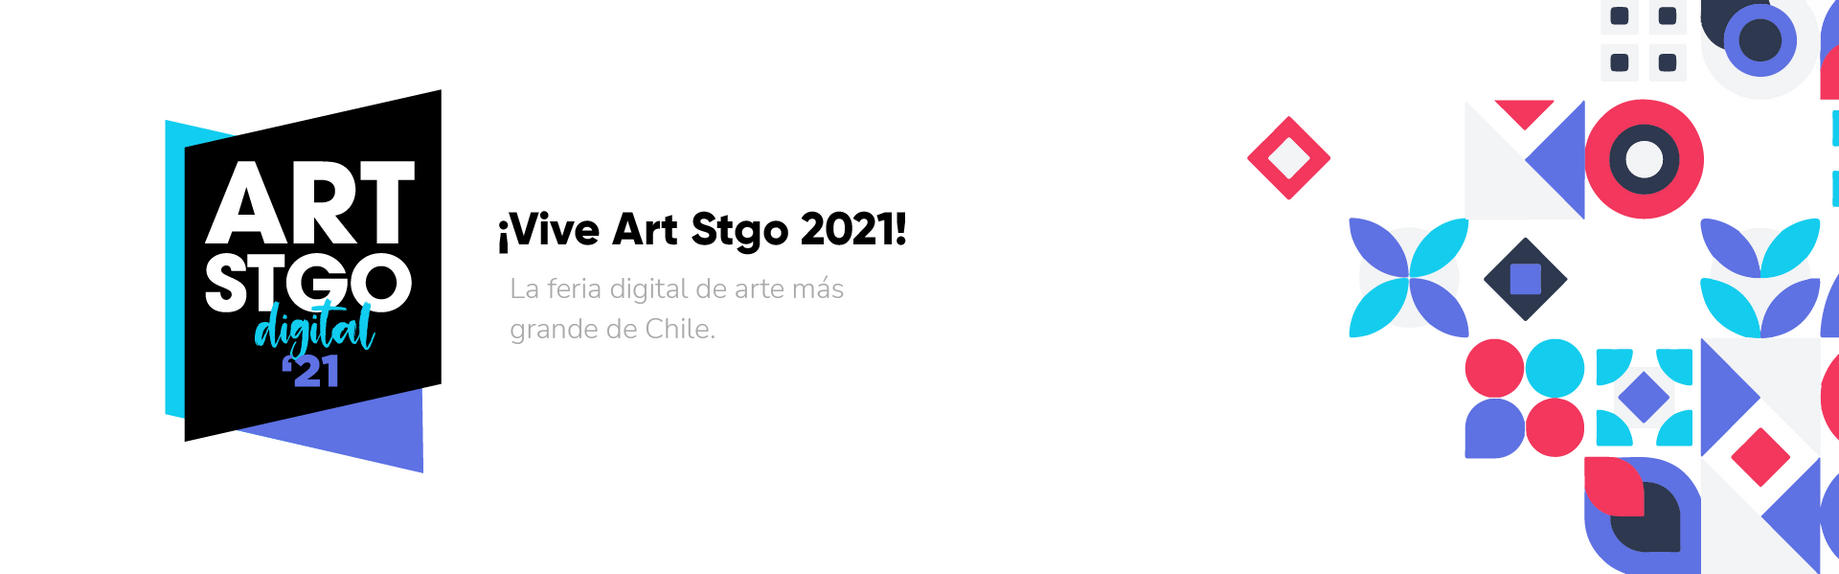 Banner_Art_Stgo_1_Mesa_de_trabajo_1.png